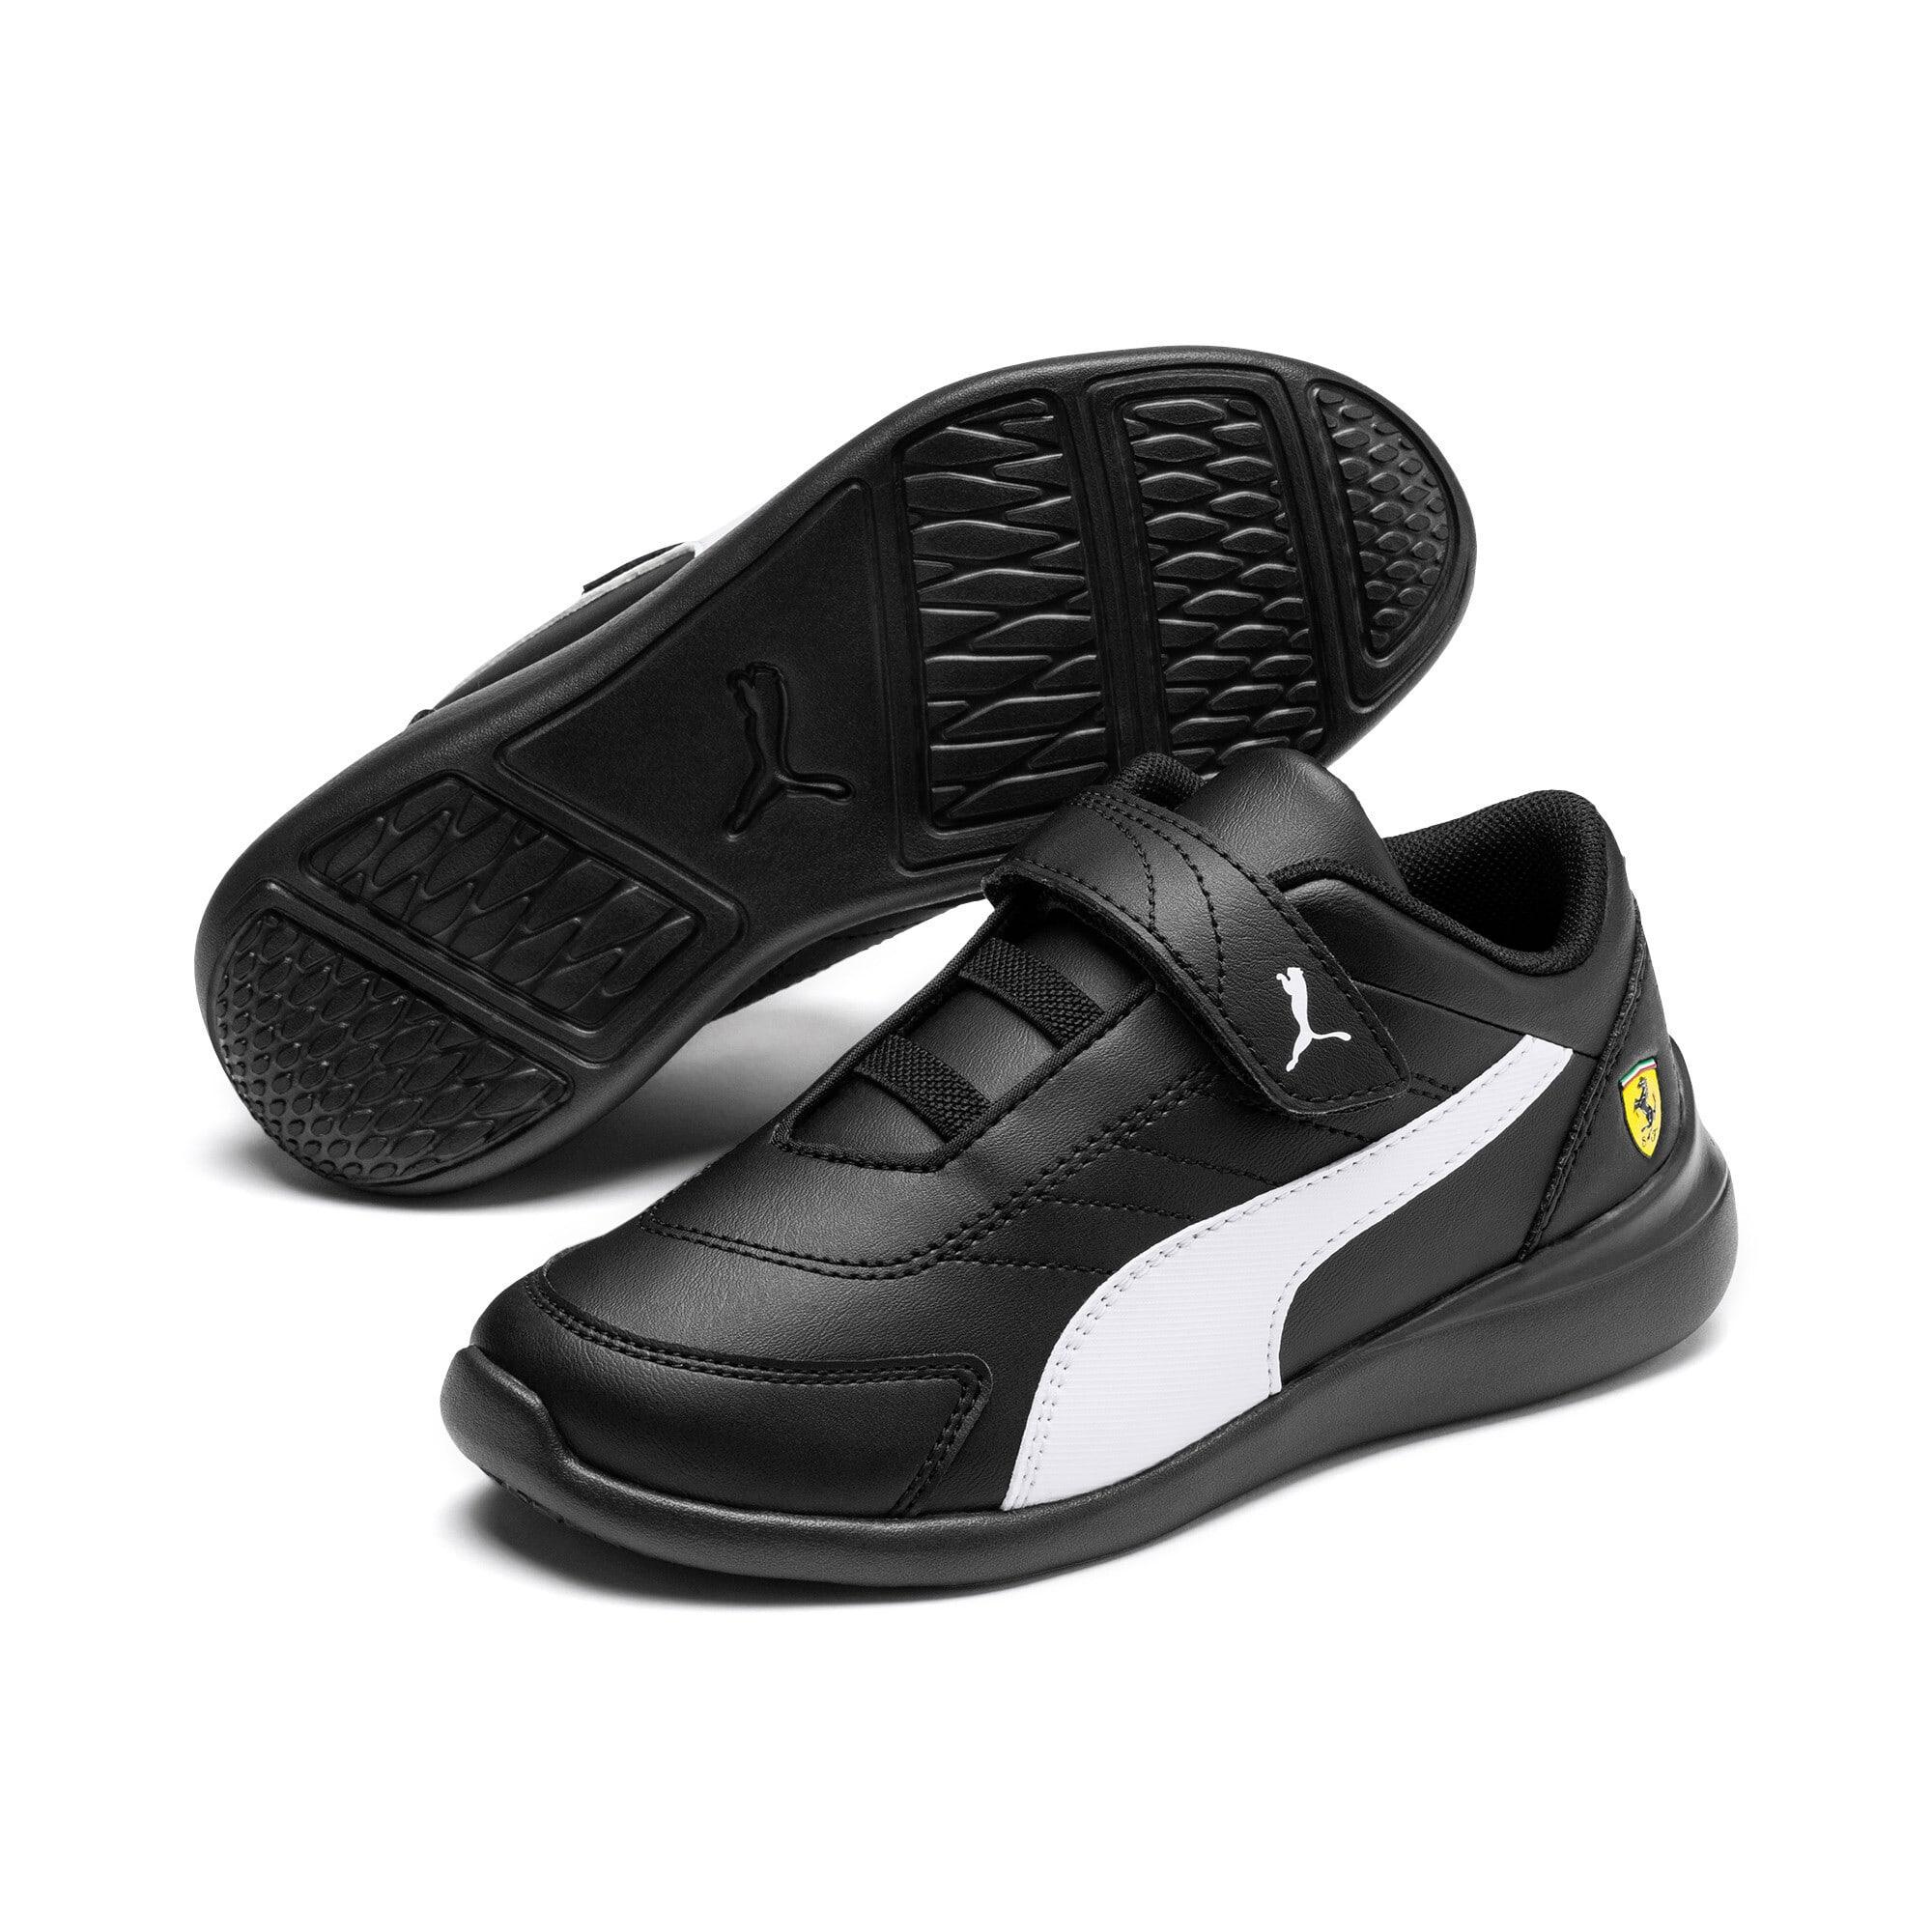 Thumbnail 2 of Scuderia Ferrari Kart Cat III Little Kids' Shoes, Black-White-Blazing Yellow, medium